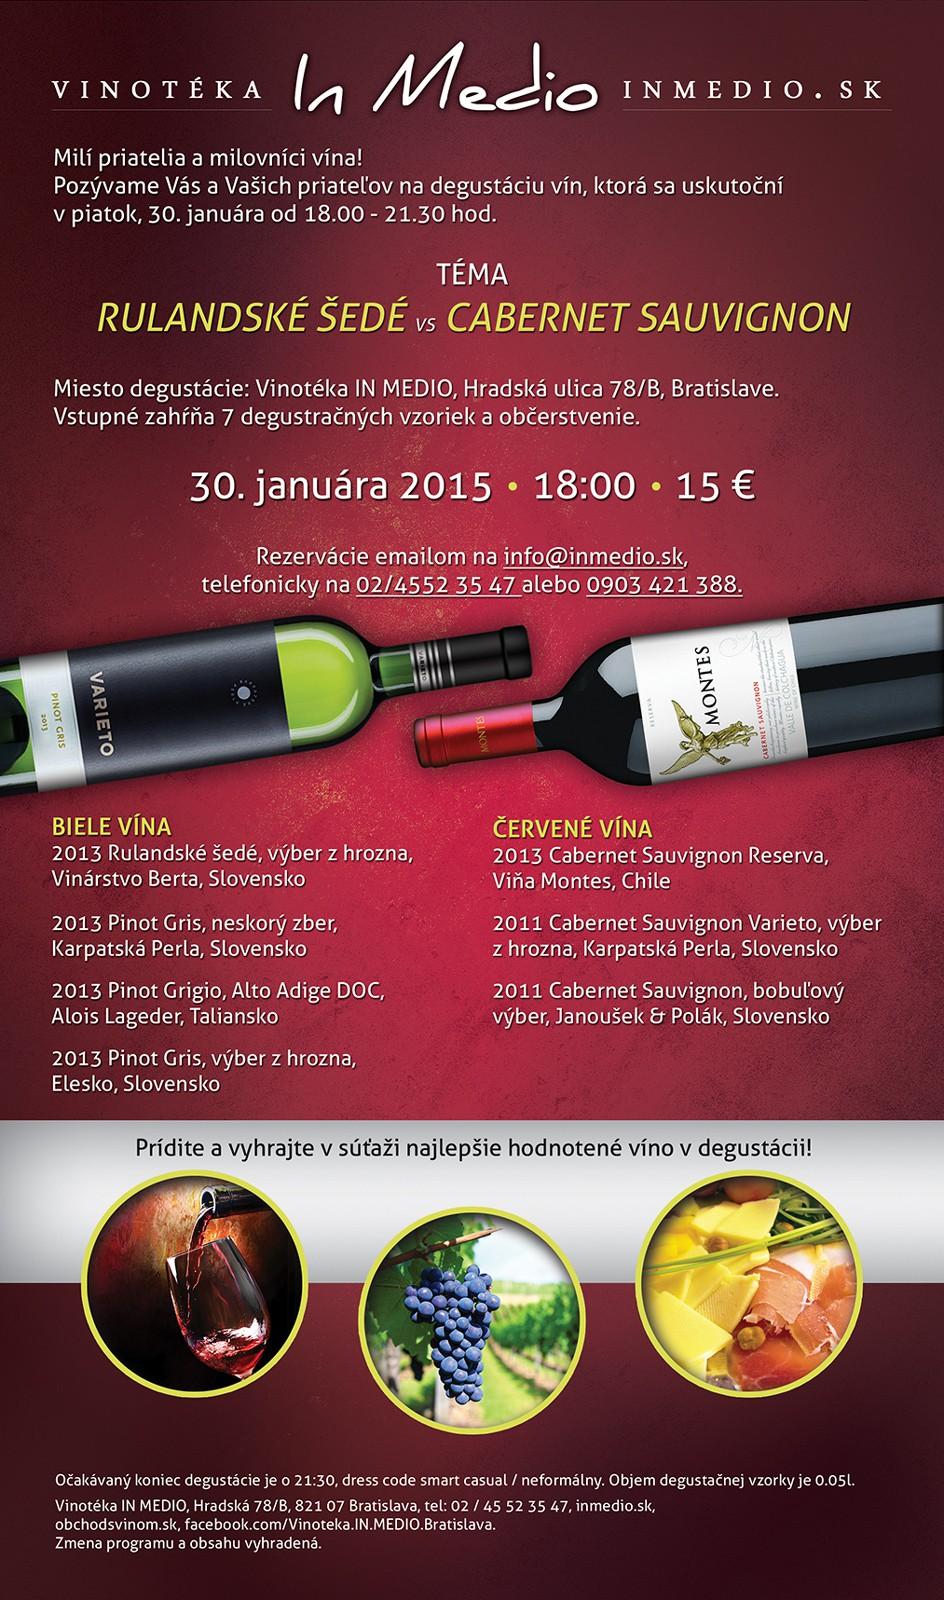 Degustácia Rulandské Šedé a Cabernet Sauvignon   piatok 30. január 2015 Vinotéka IN MEDIO Bratislava